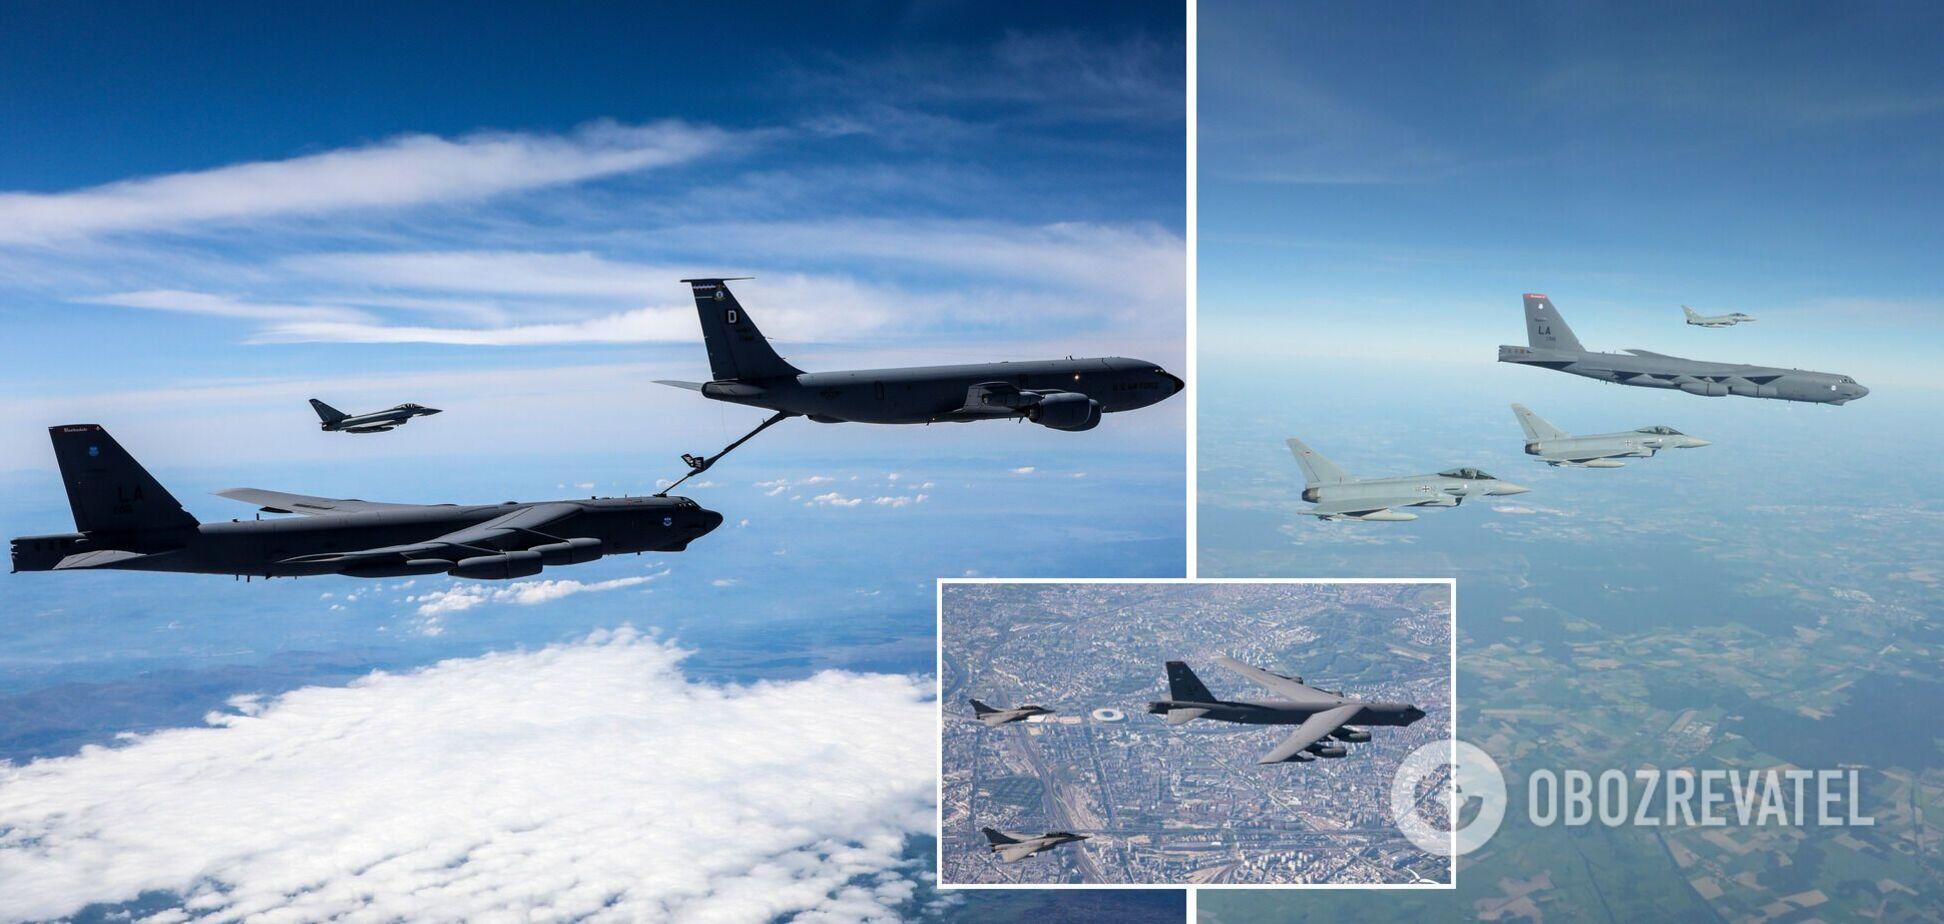 В НАТО отправили 'послание Путину' масштабными маневрами в небе над Европой. Видео